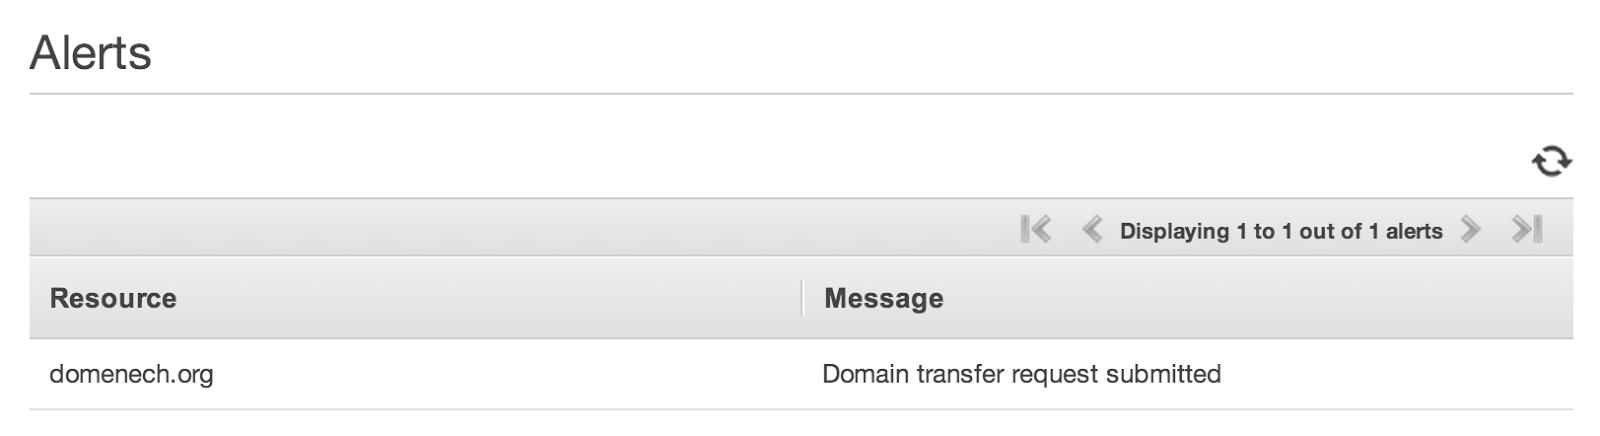 blog-domenech-org-transfer-internet-domain-to-aws-route-53-step-dashboard-7a